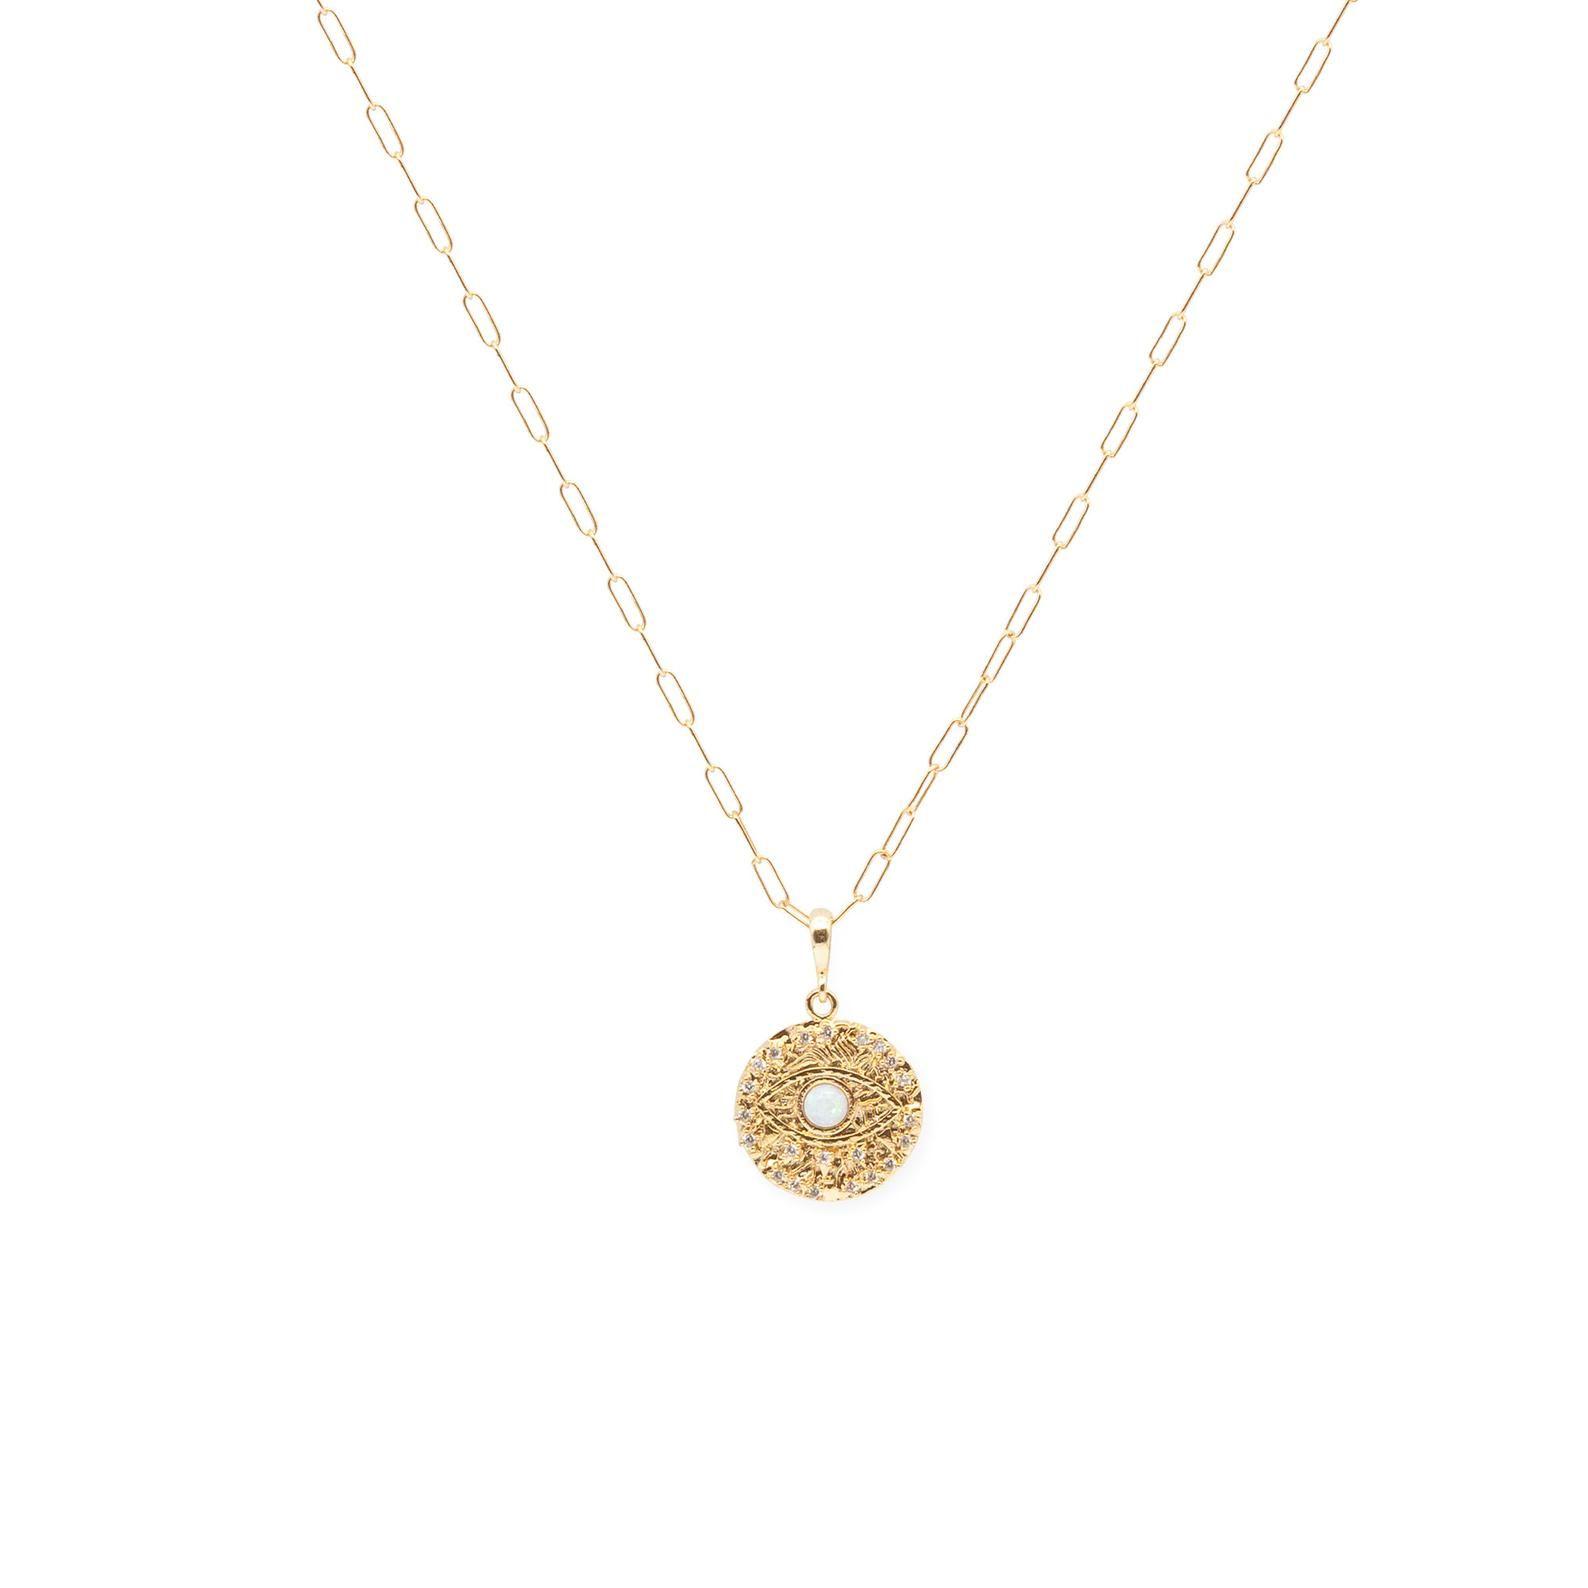 Opal Evil Eye Necklace, Gold, Coin Charm, Shimmeri